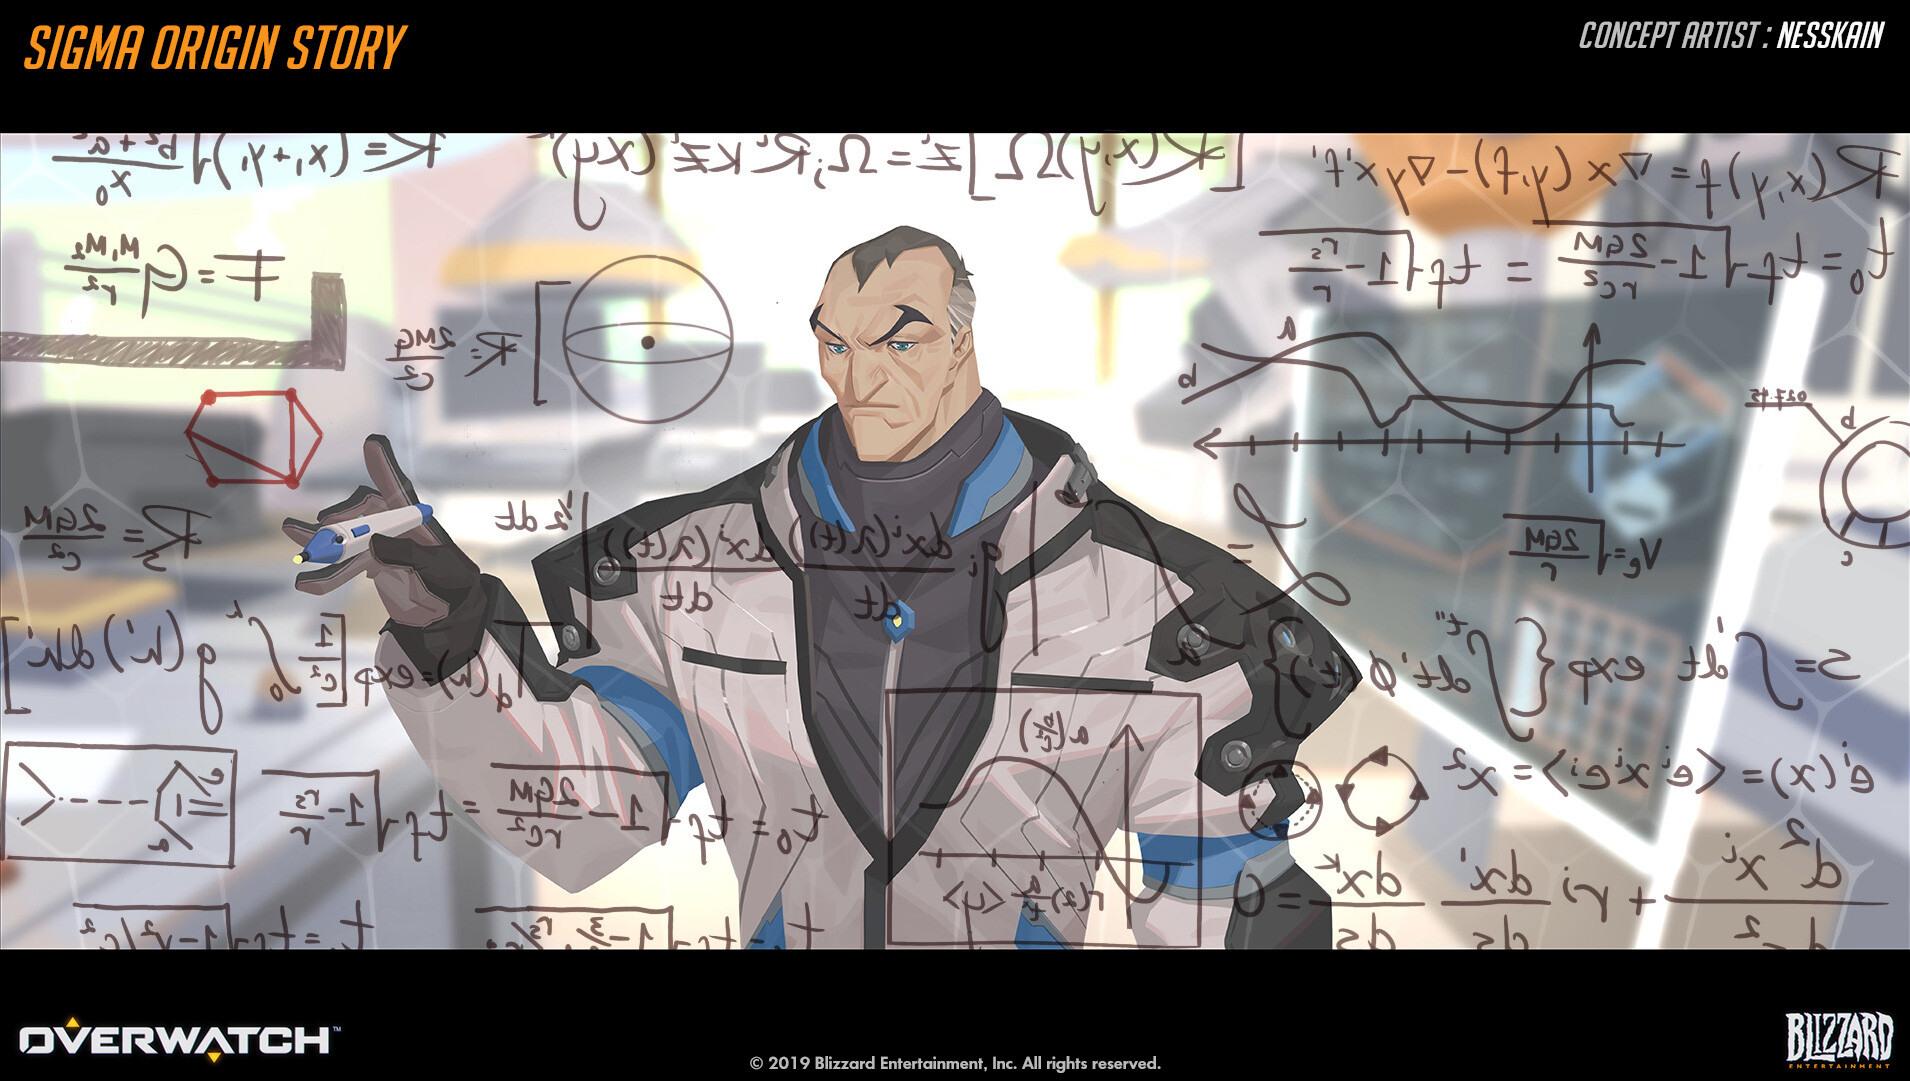 Nesskain/Blizzard Entertainment